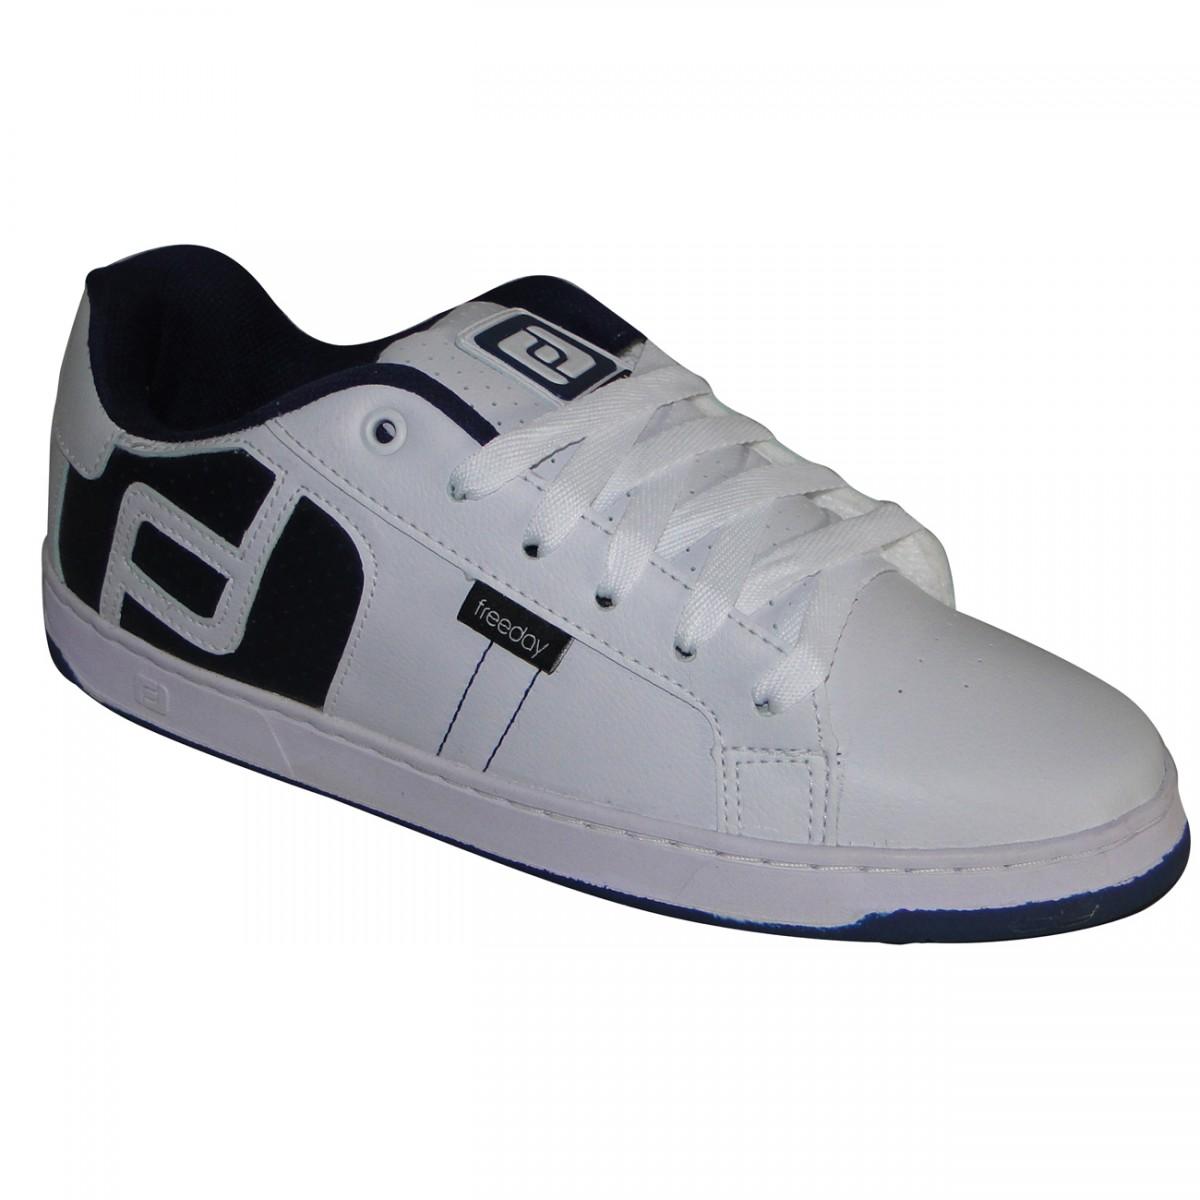 b151463a6d8 TENIS FREEDAY LOGO 19900BCOMHO - BRANCO MARINHO - Chuteira Nike ...